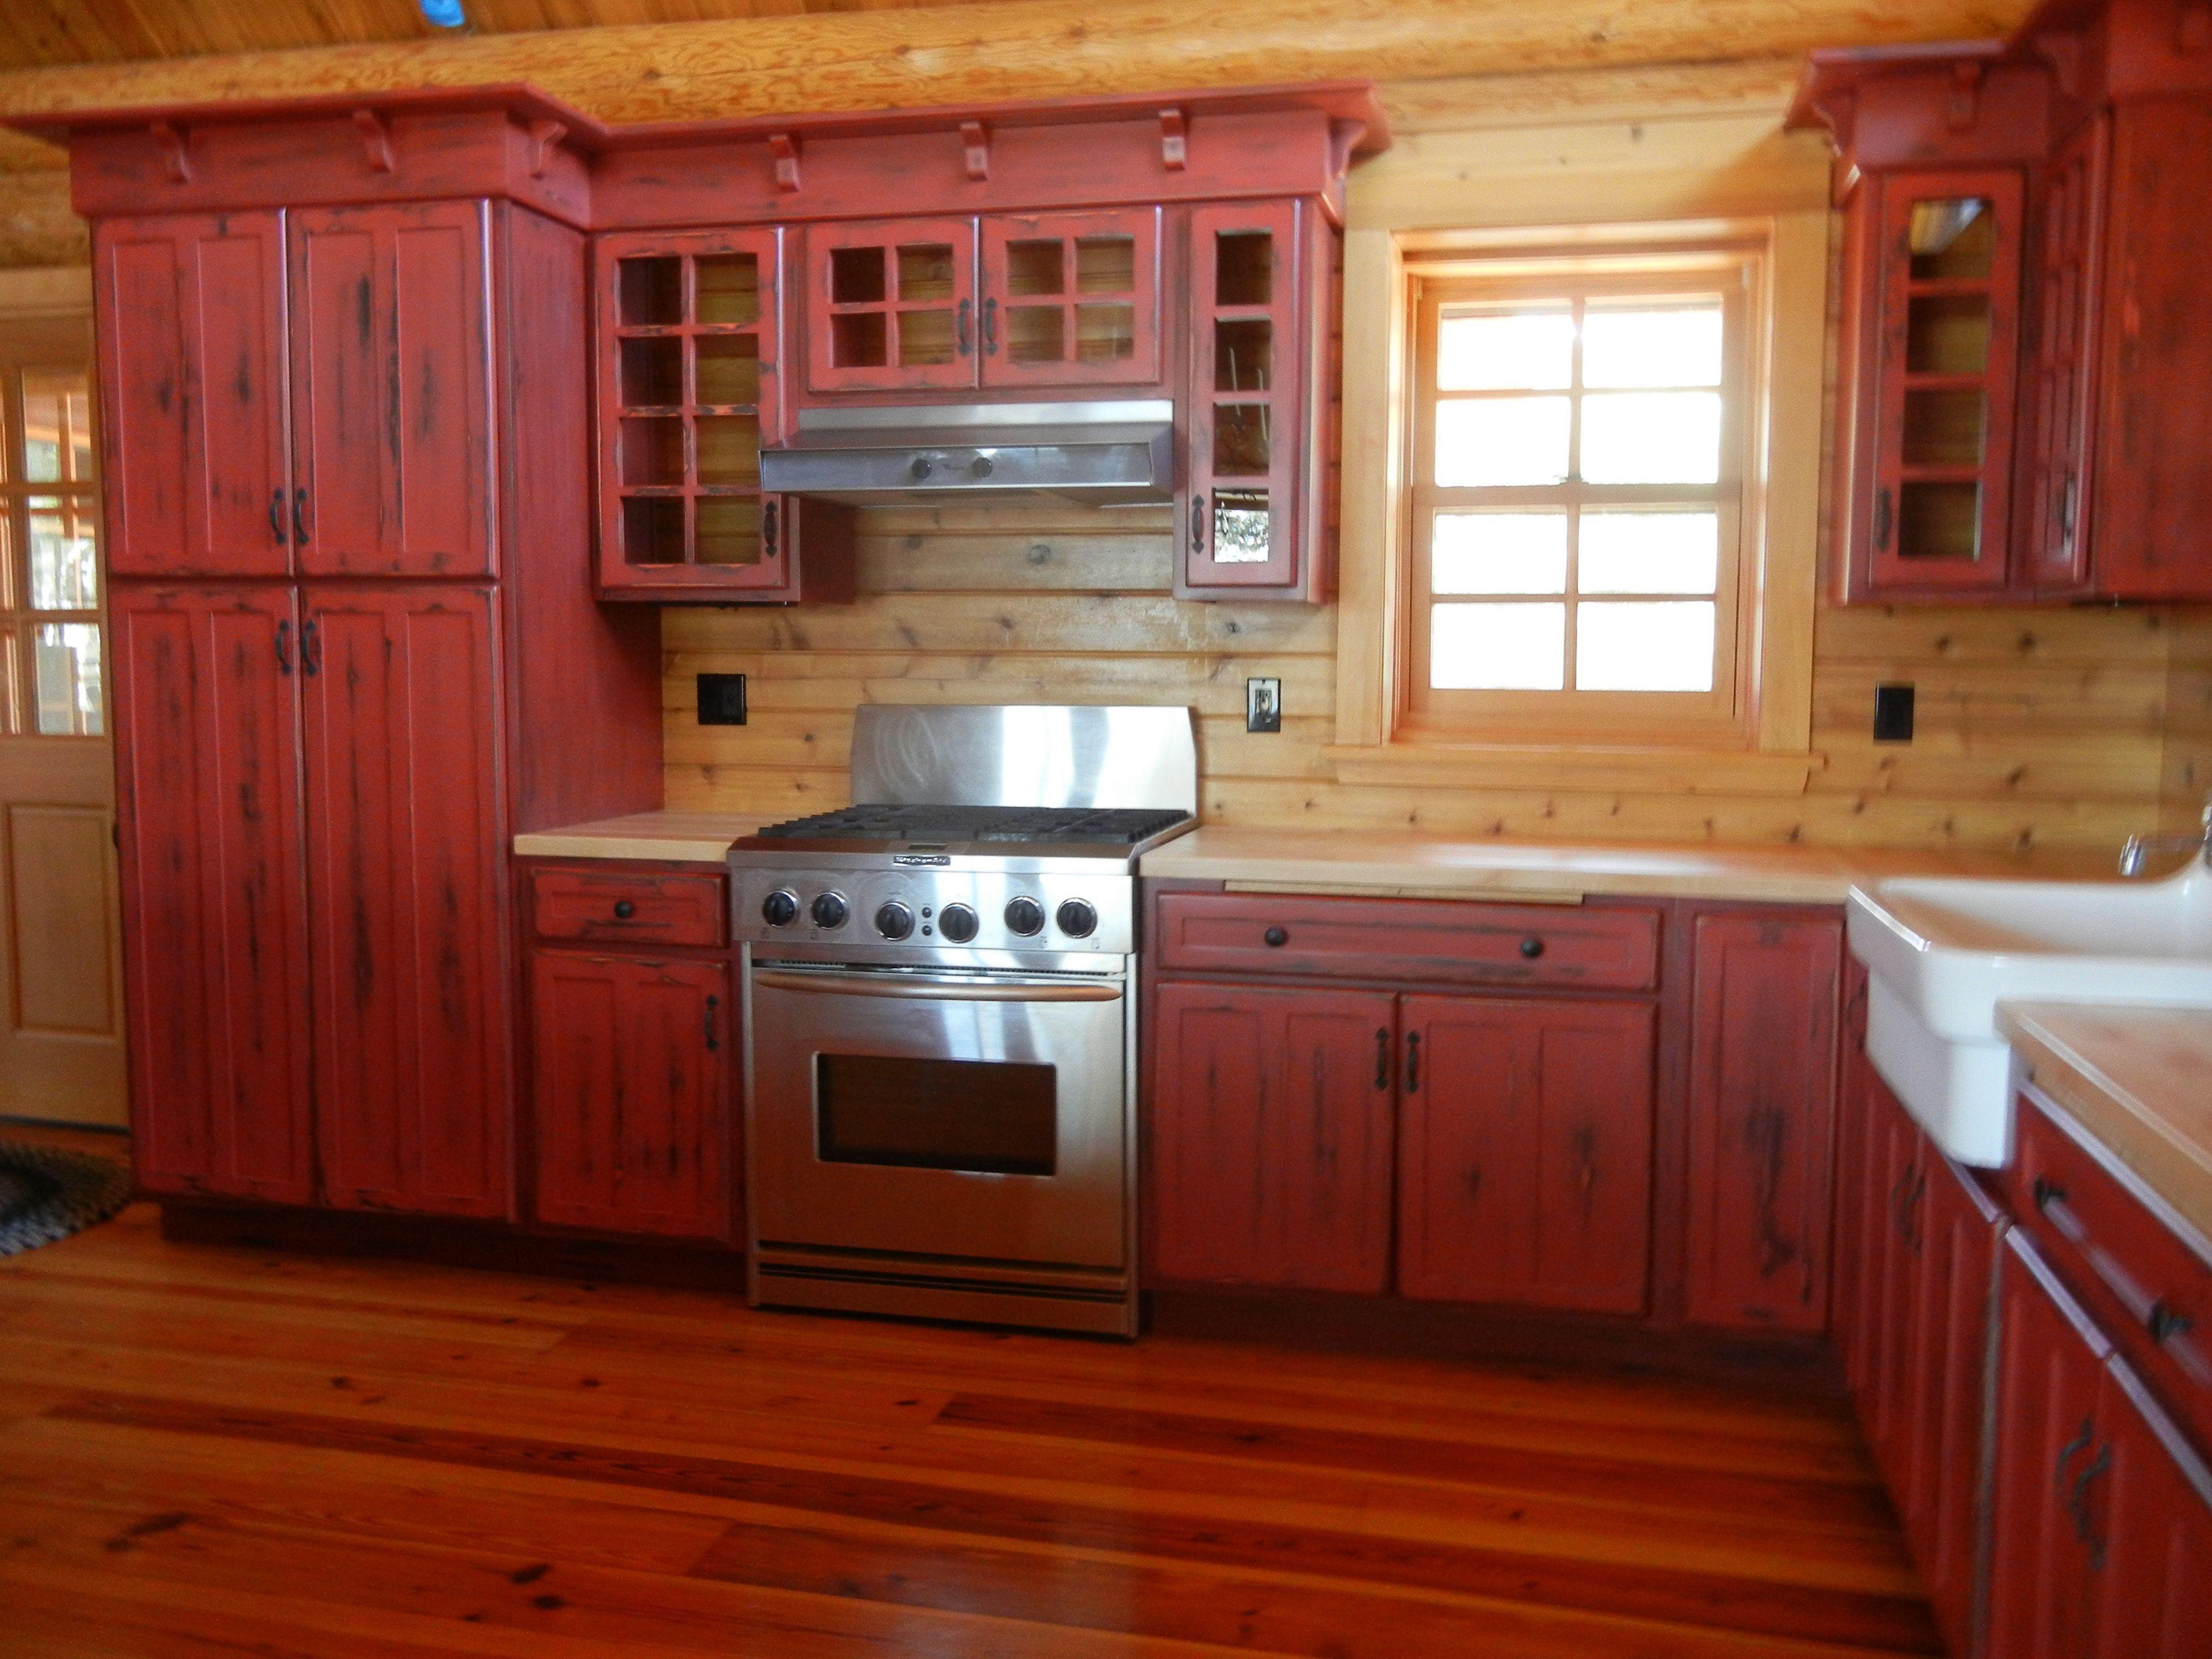 gorgeous 20 rustic kitchen design ideas on a budget rustickitchendesigns mutfak yenileme on kitchen ideas on a budget id=43324